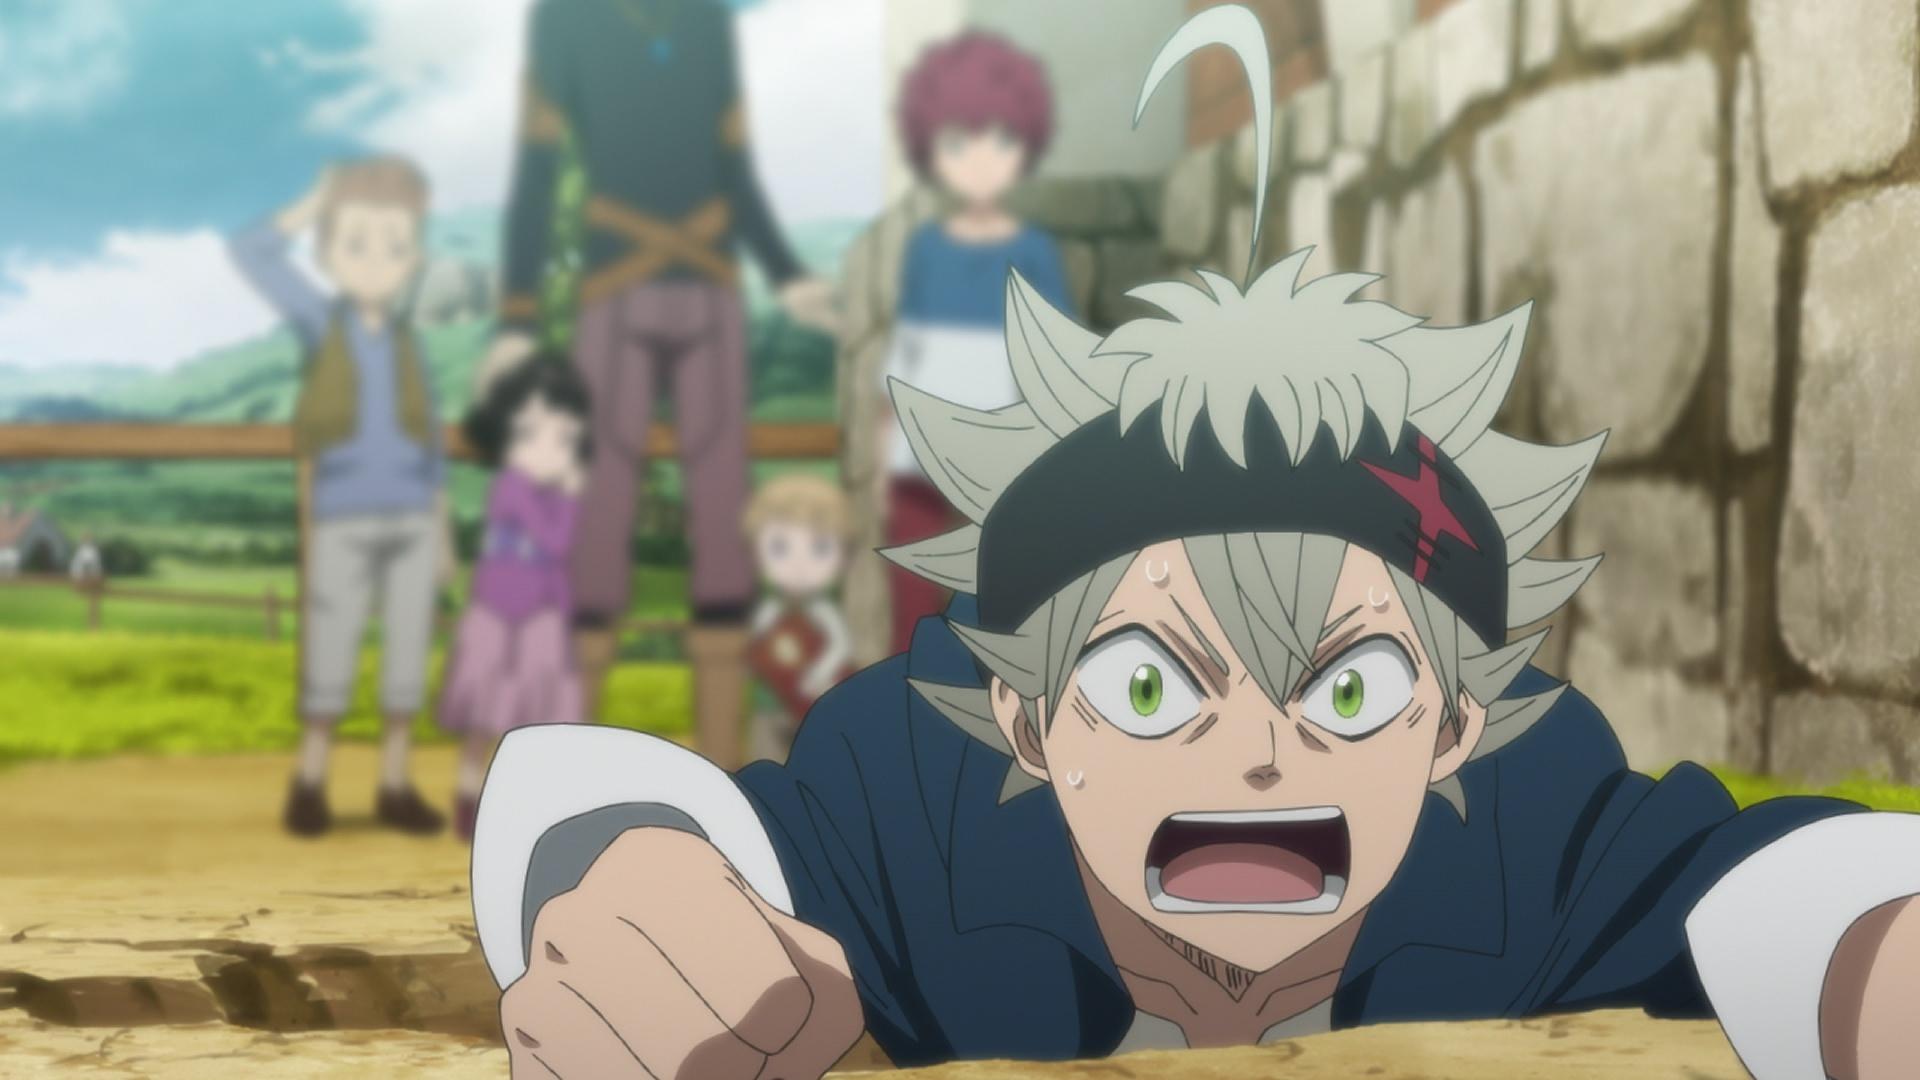 Watch Black Clover Season 1 Episode 1 Sub & Dub | Anime